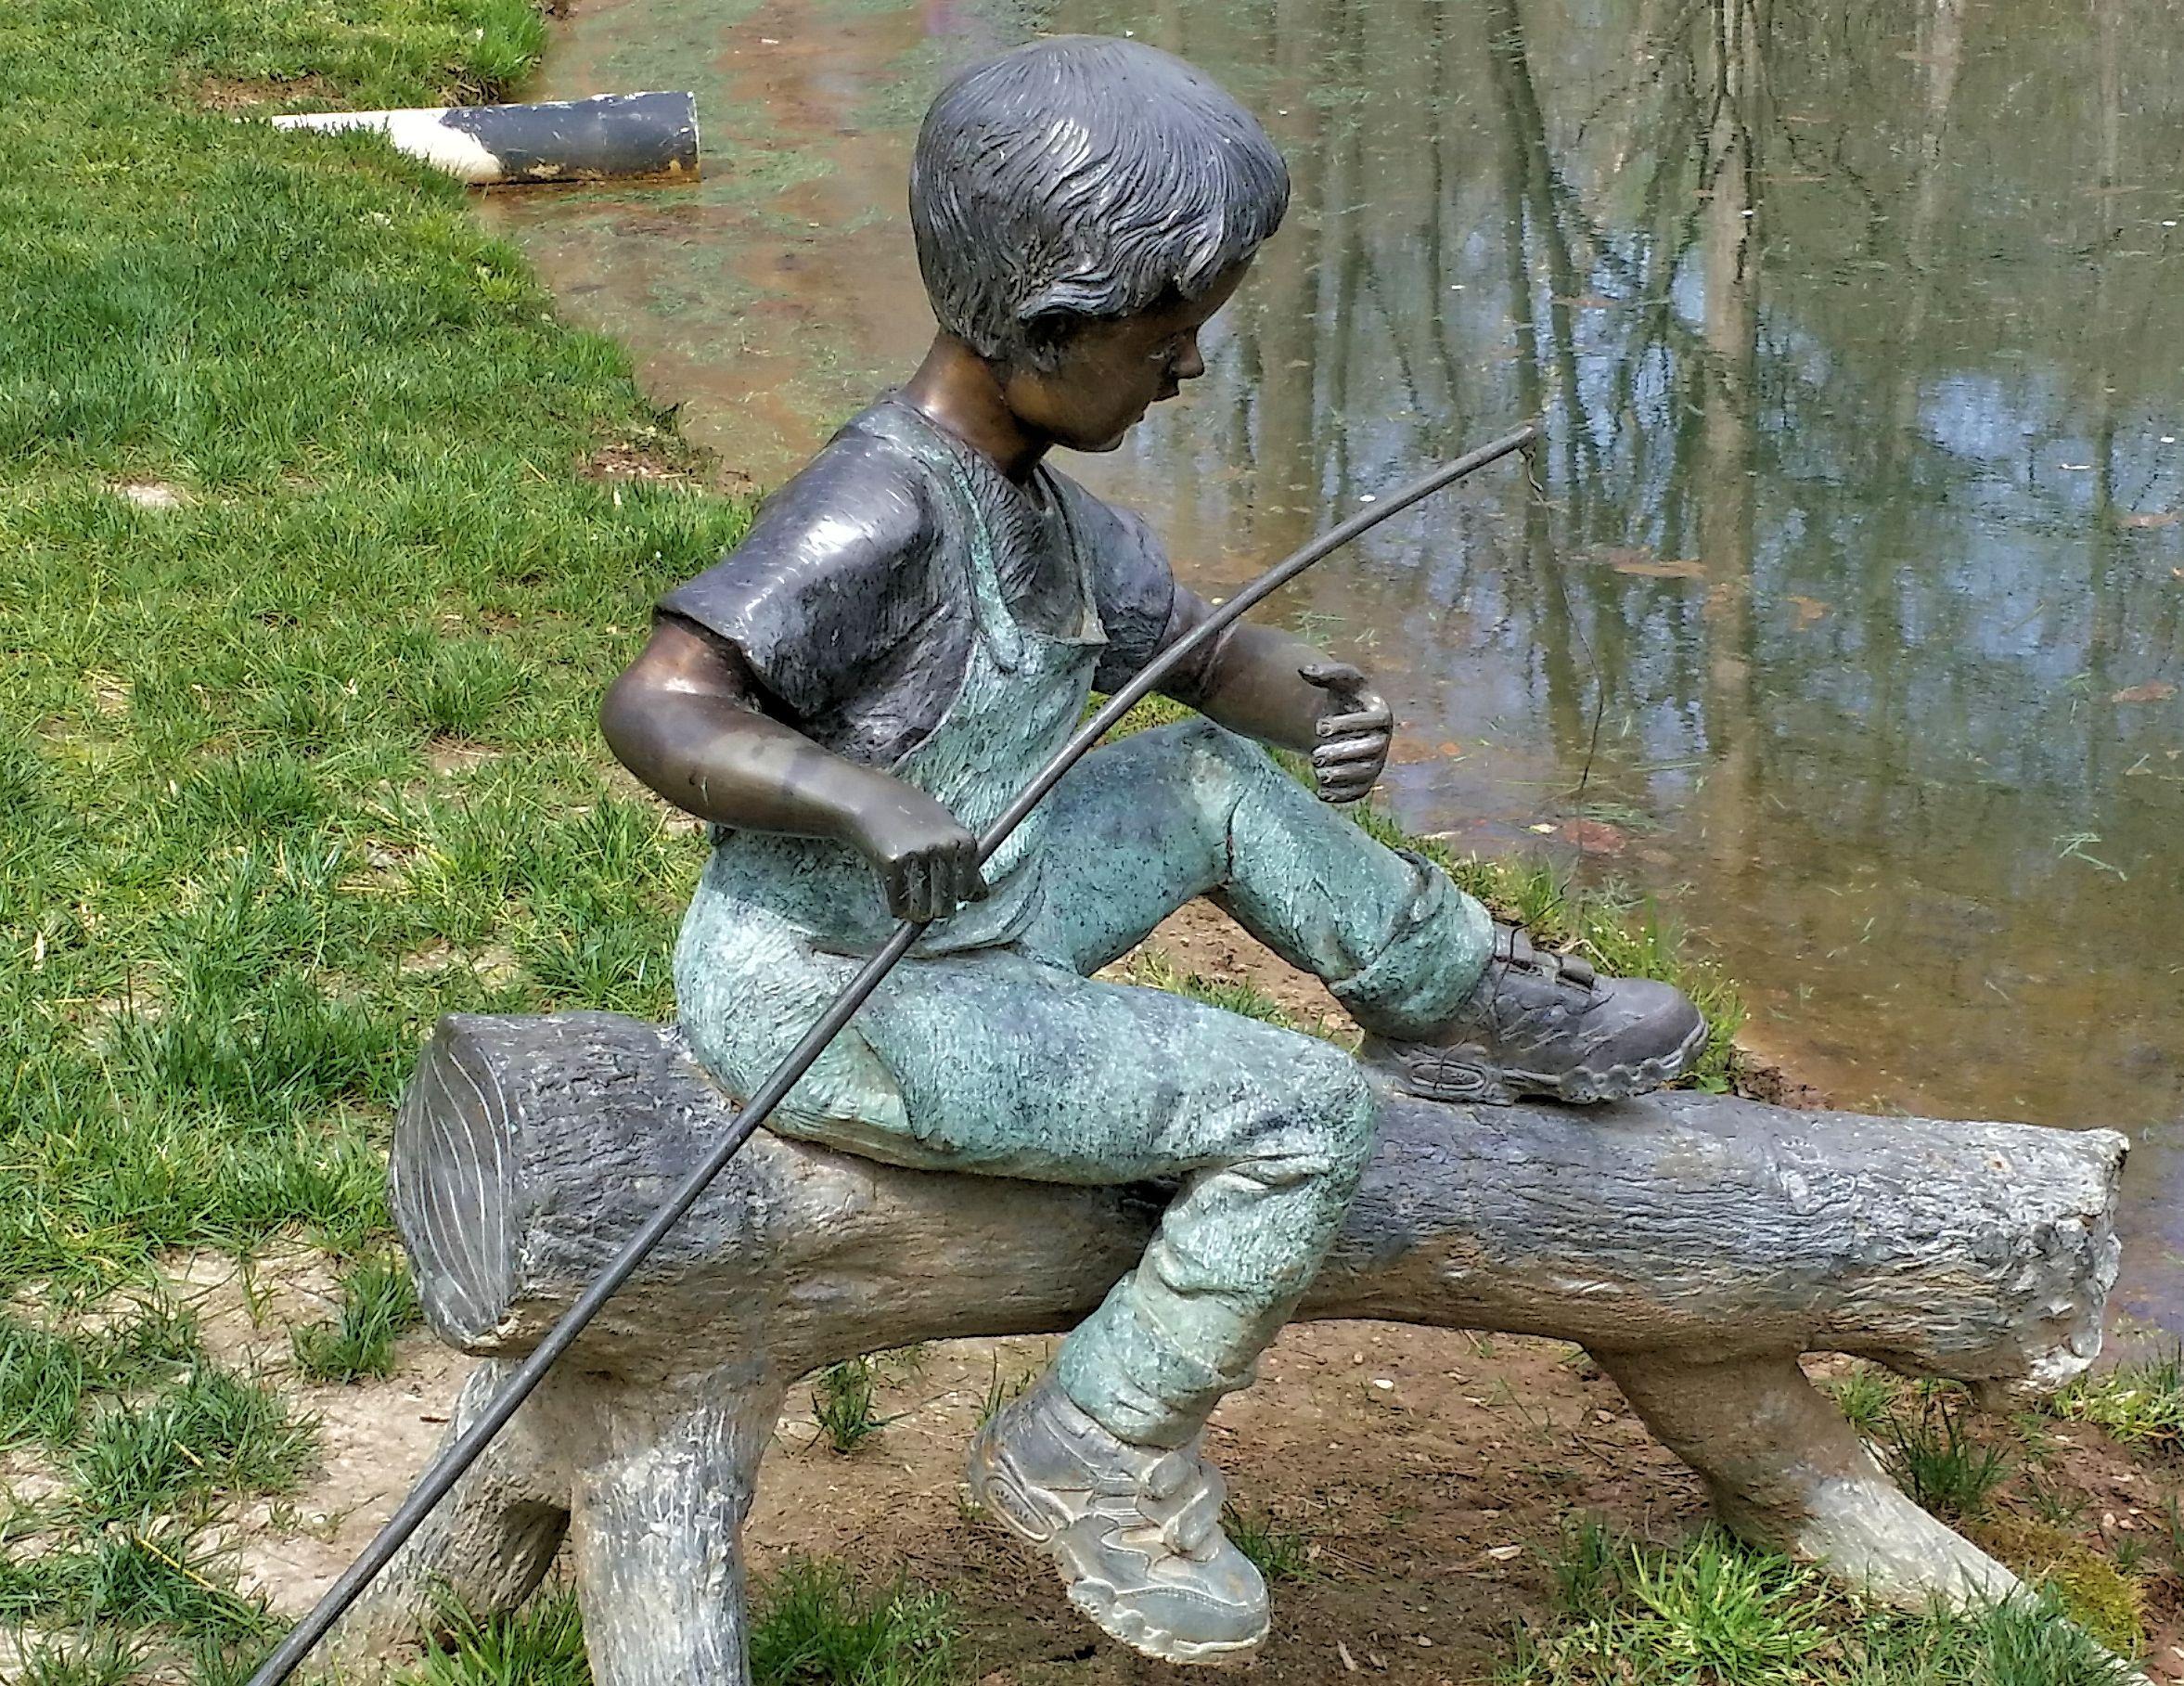 Garden statue of boy fishing at gibbs 39 garden mar 2016 for Little boy fishing statue